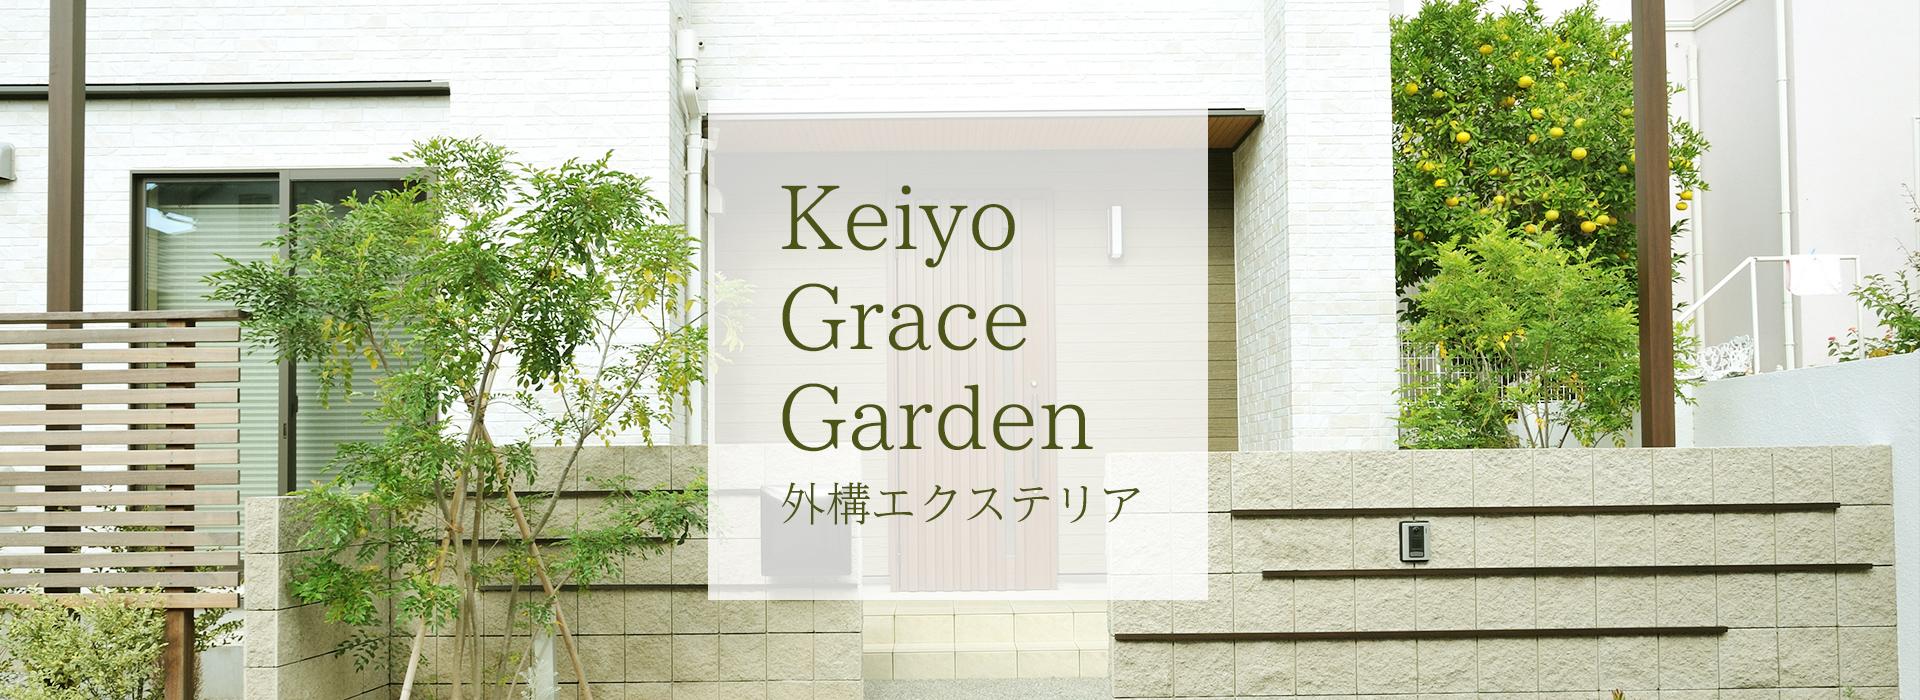 KeiyoGraceGarden外溝エクステリア